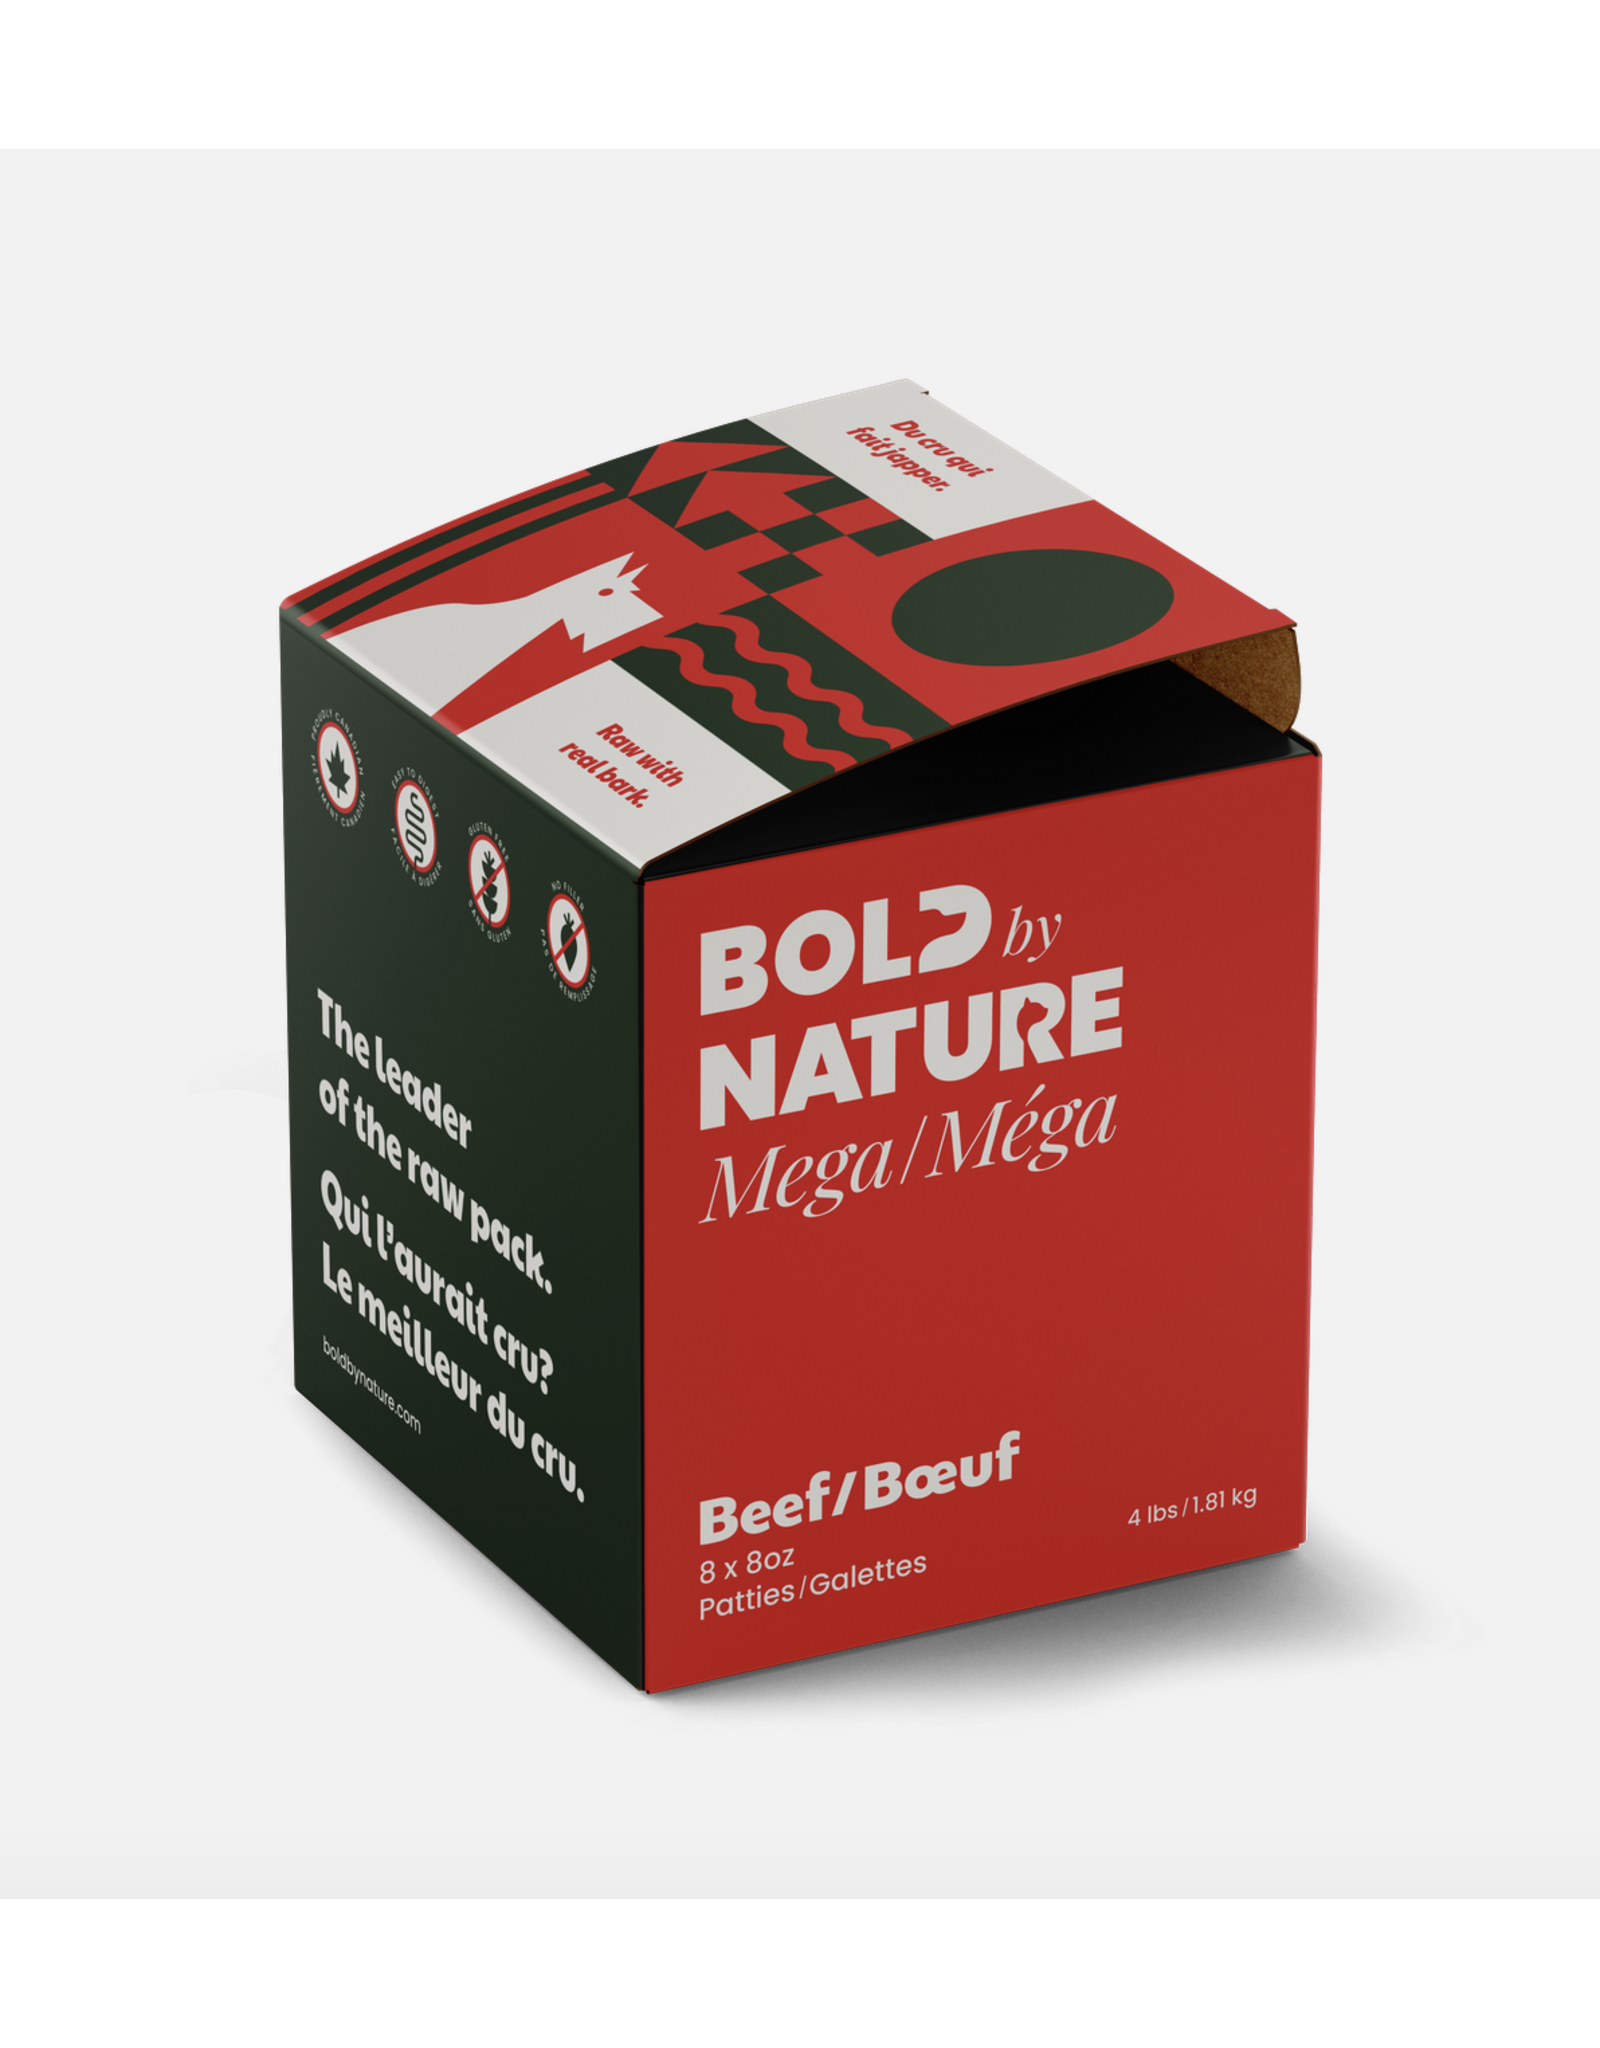 Mega Dog Bold by Nature - Mega - Beef - 4lb Box